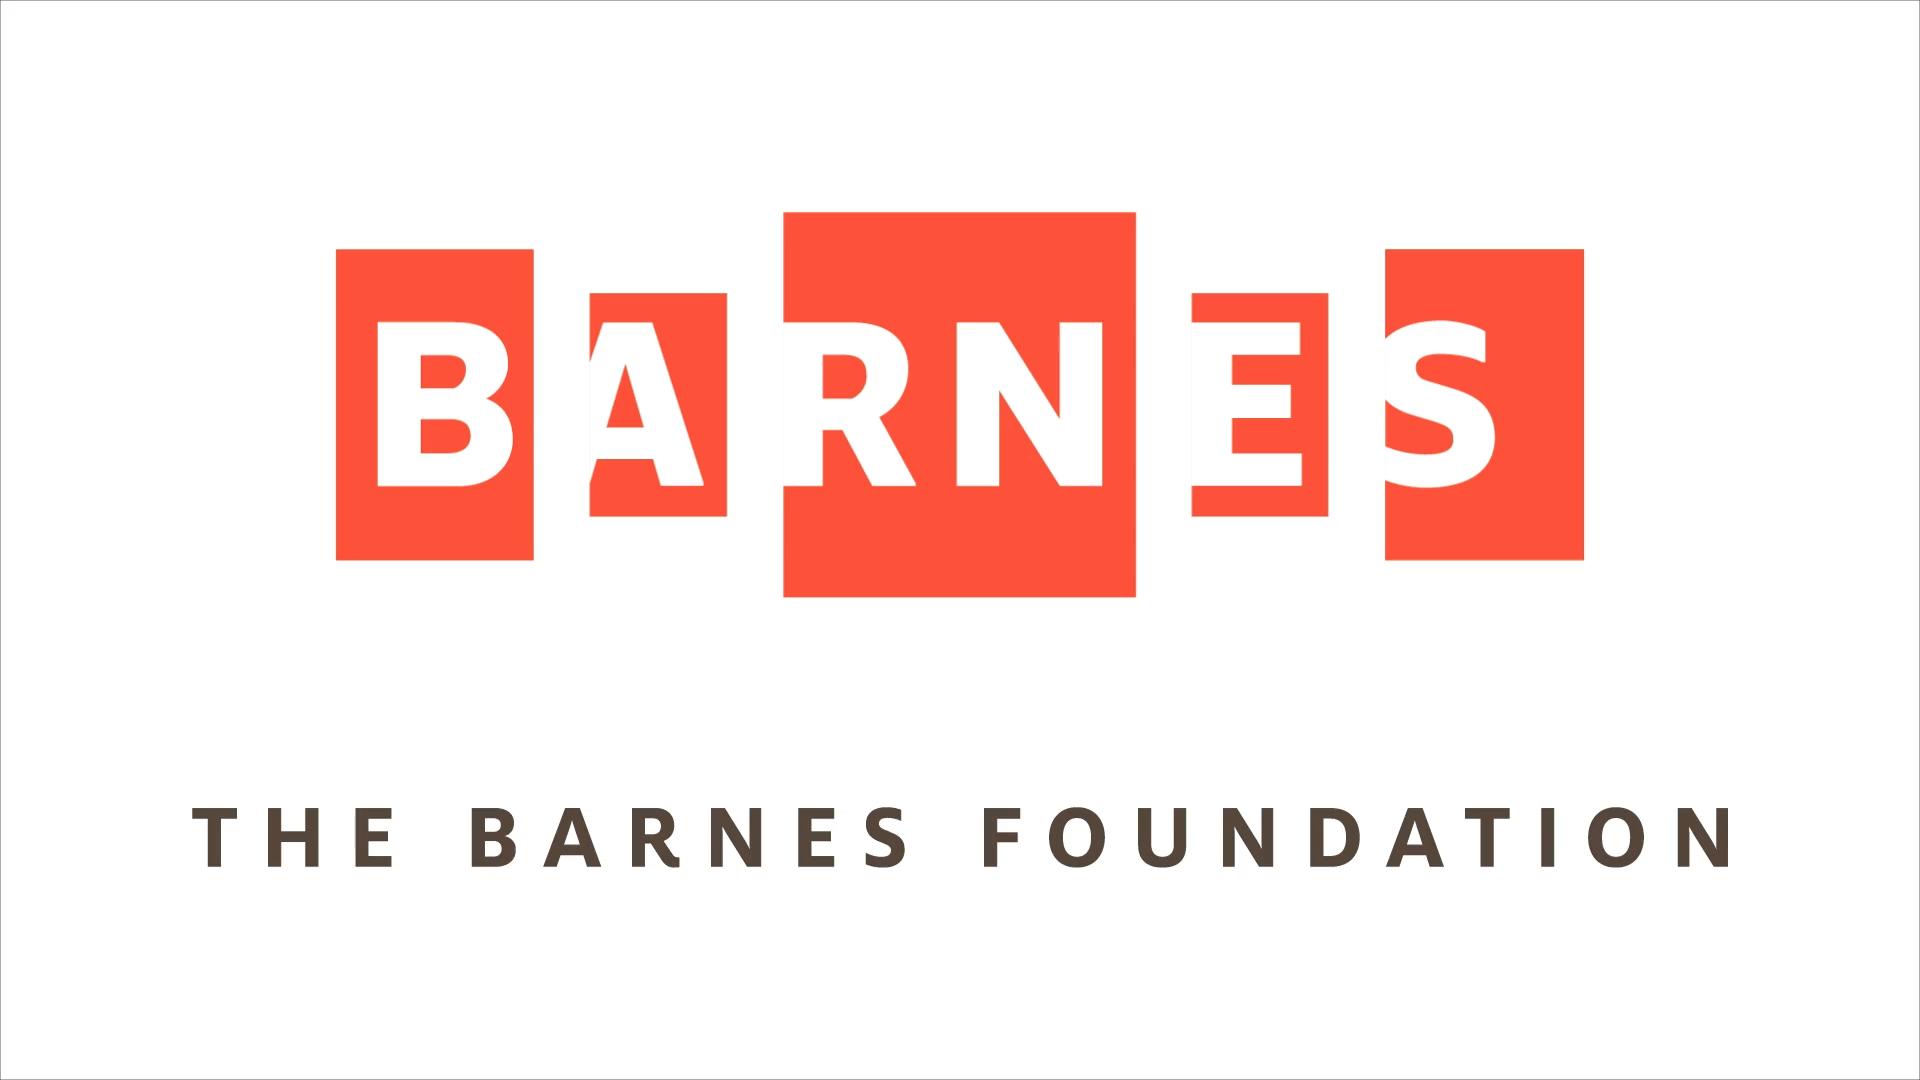 BarnesFoundation.png